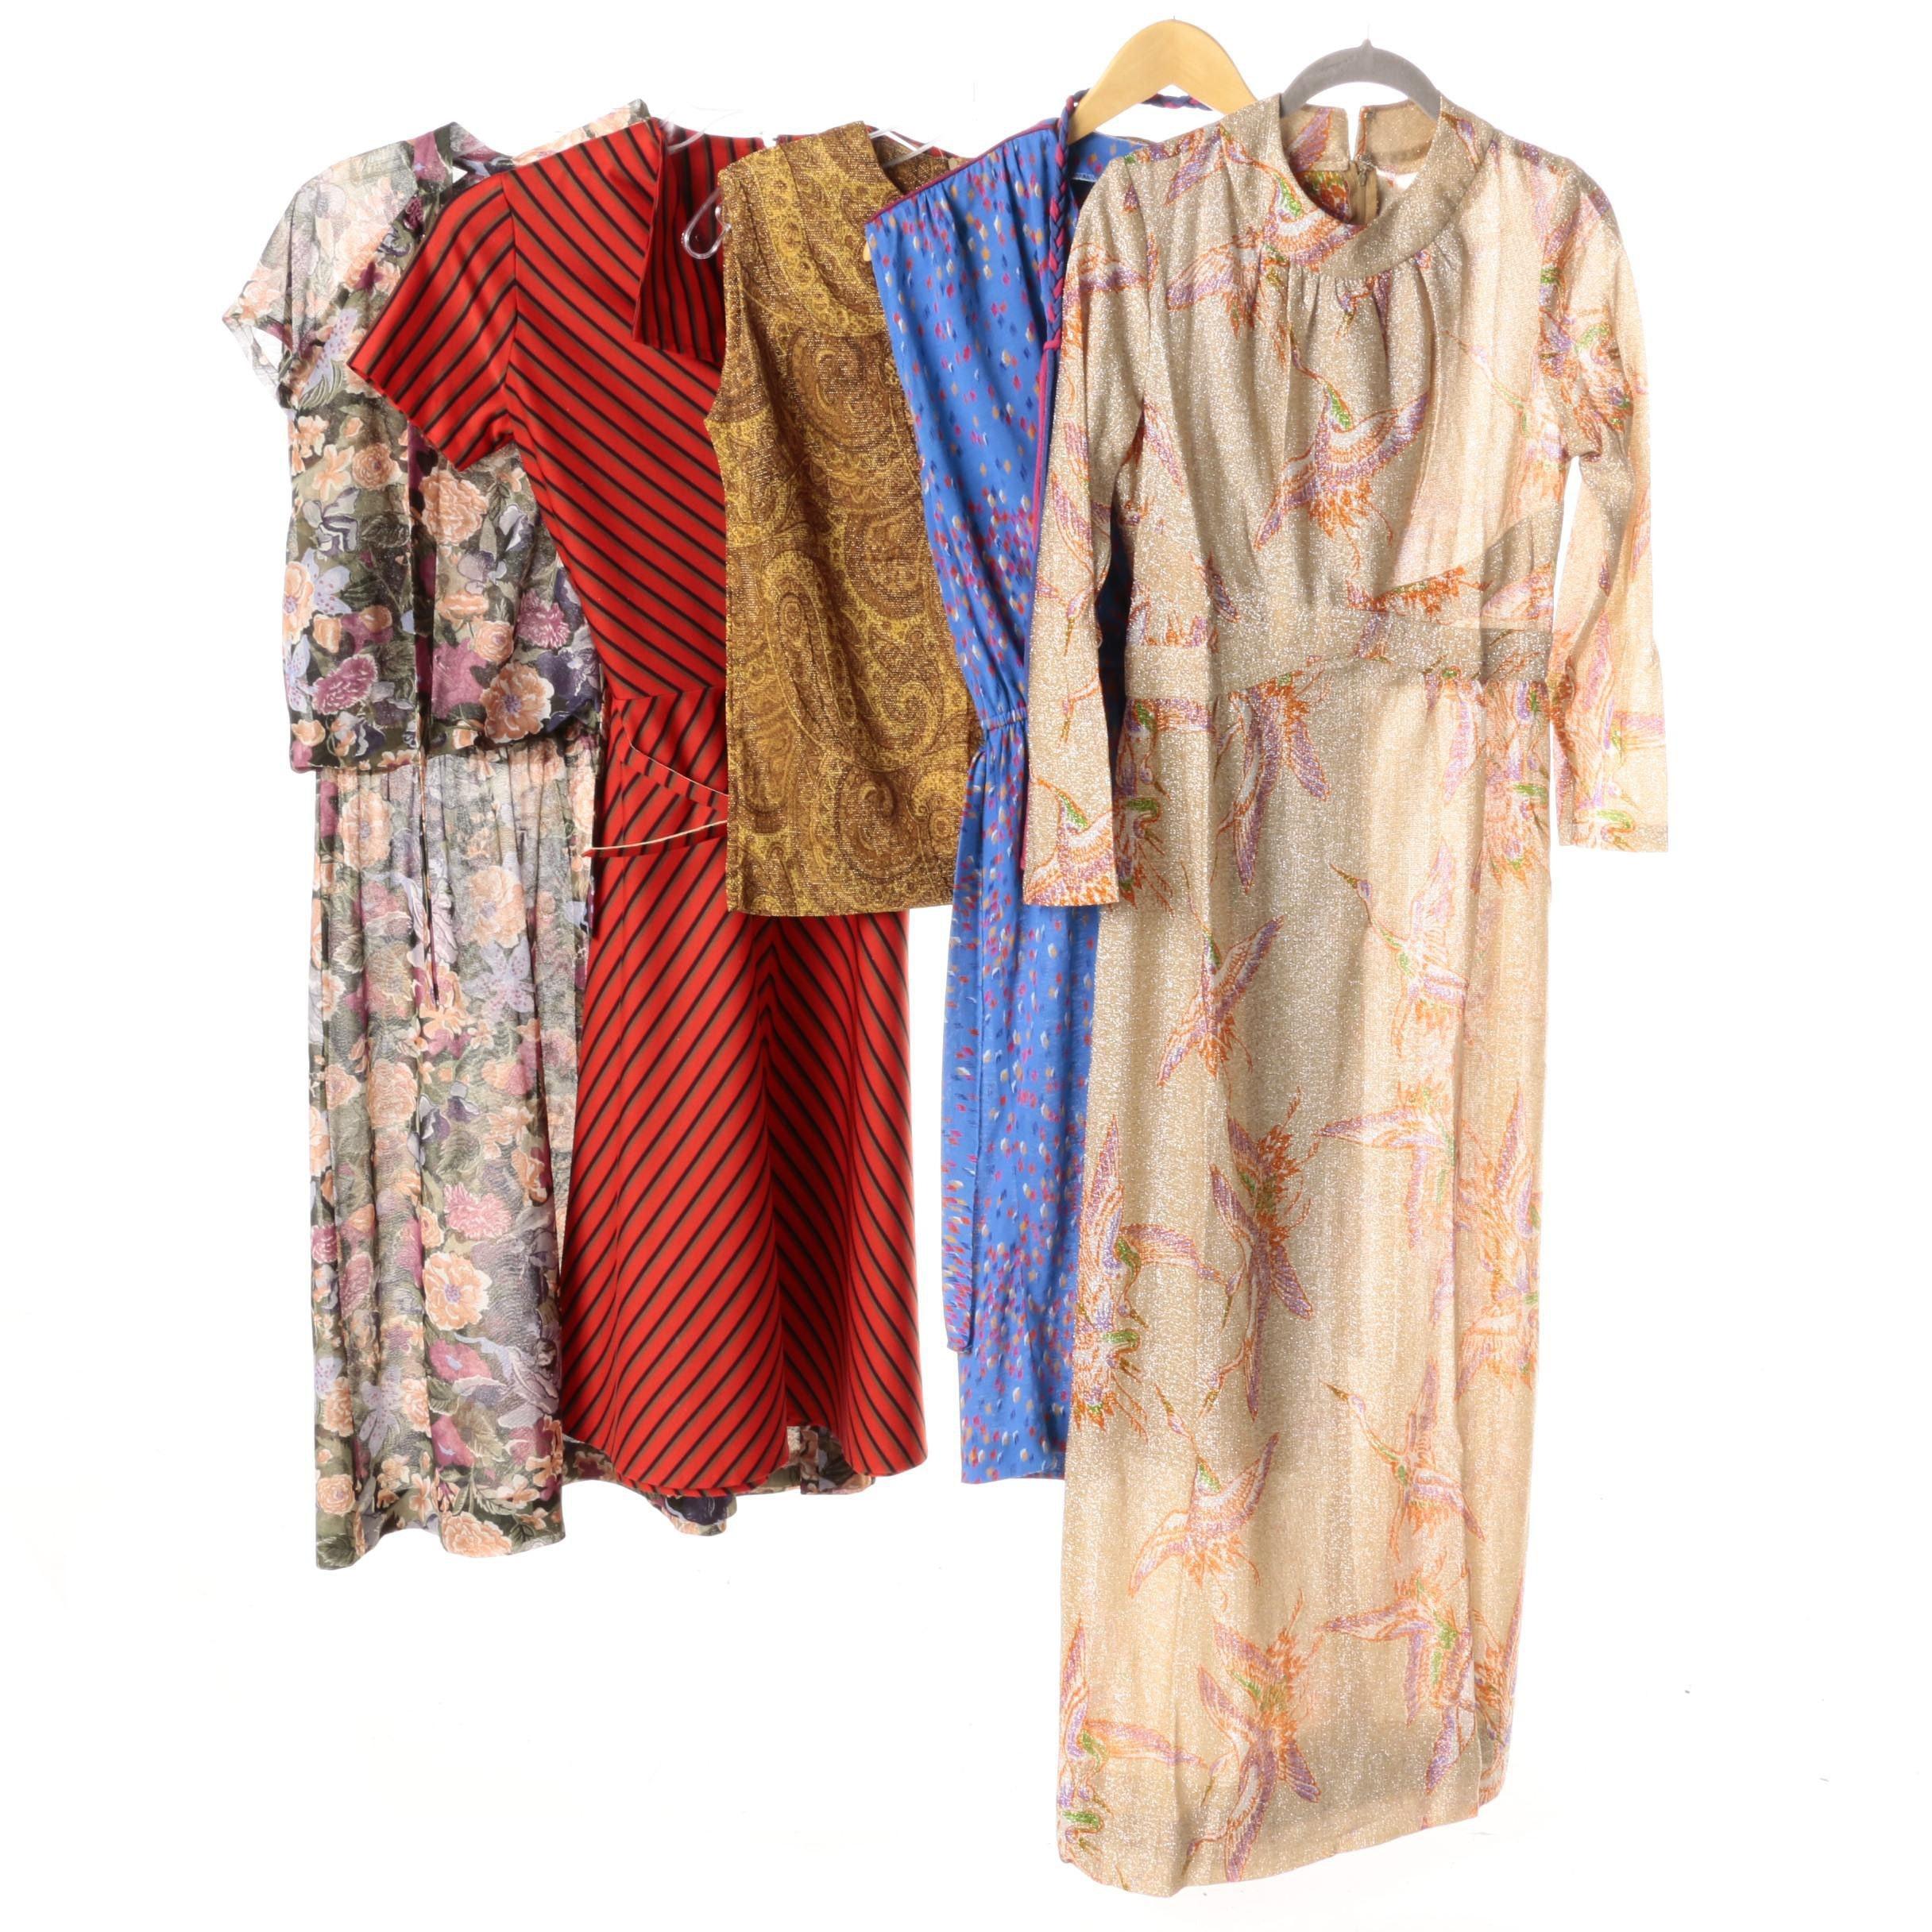 Women's Vintage Dress Collection